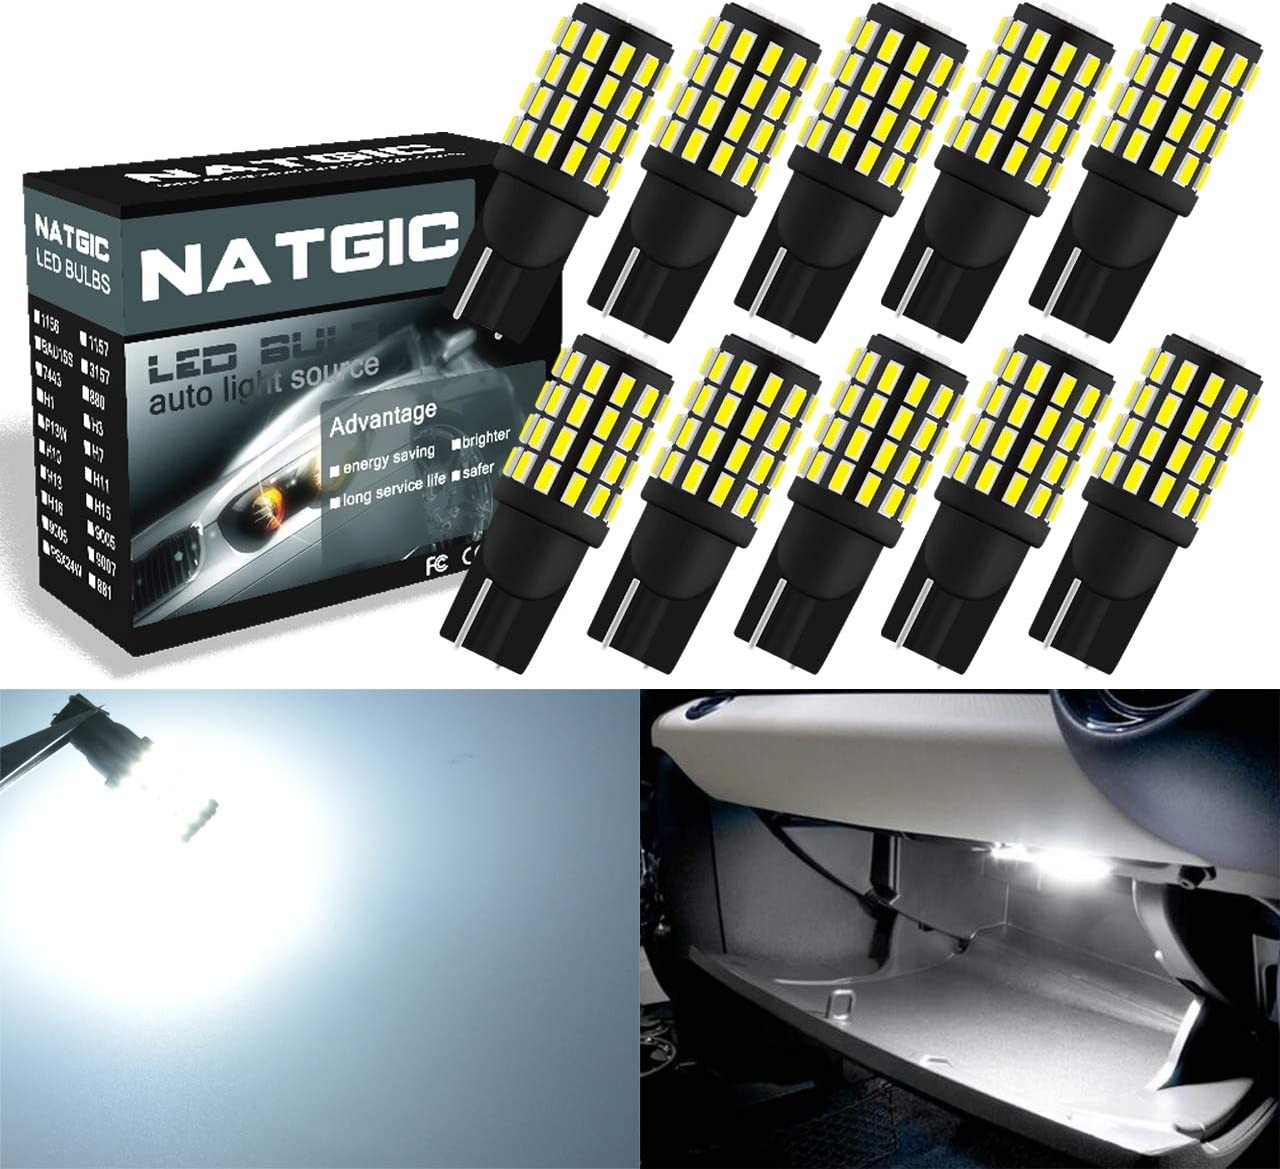 NATGIC 10pcs T10168 175 194 2825 LED San Francisco Mall B High material Replacement Light W5W